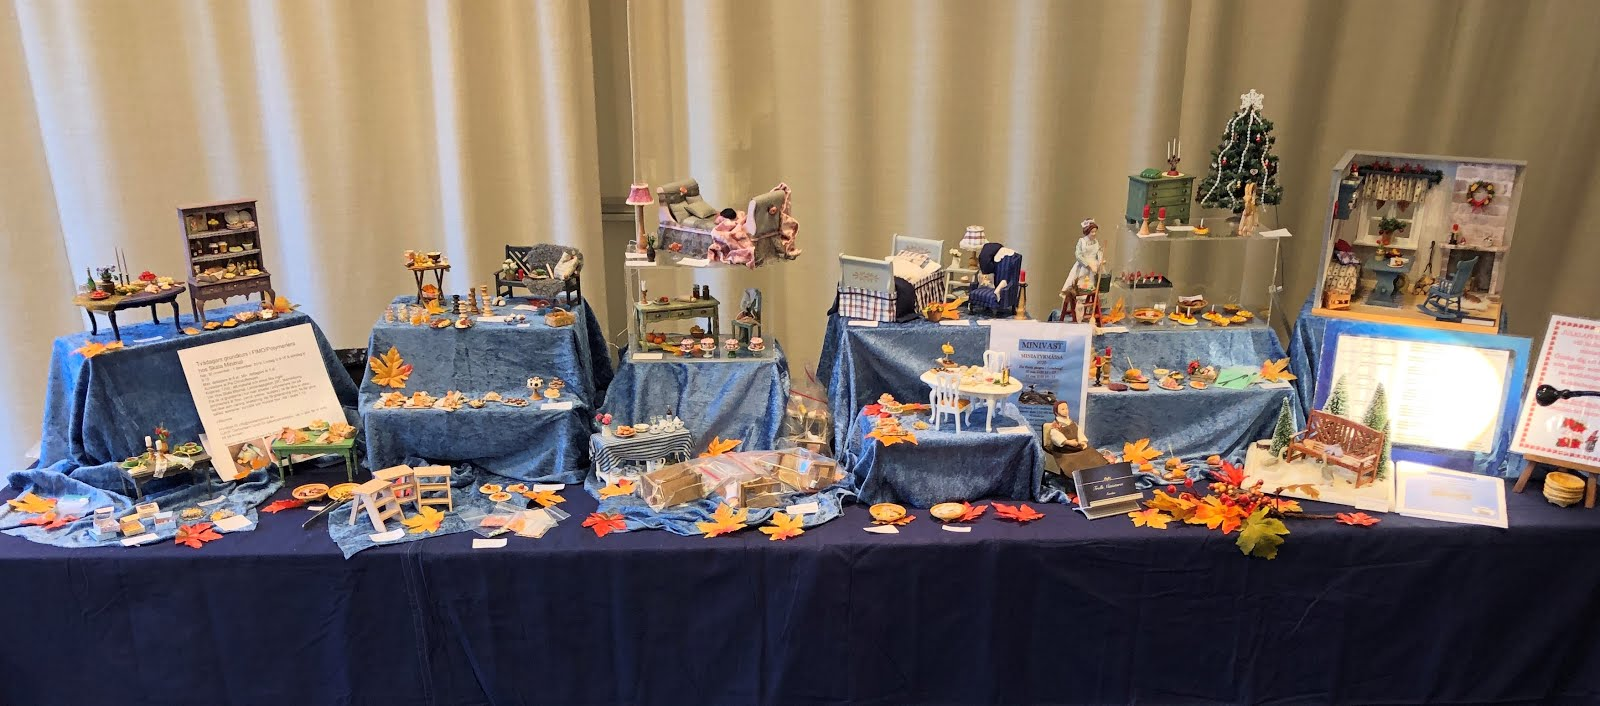 Frolls Miniatures hemsida & Handelsbod